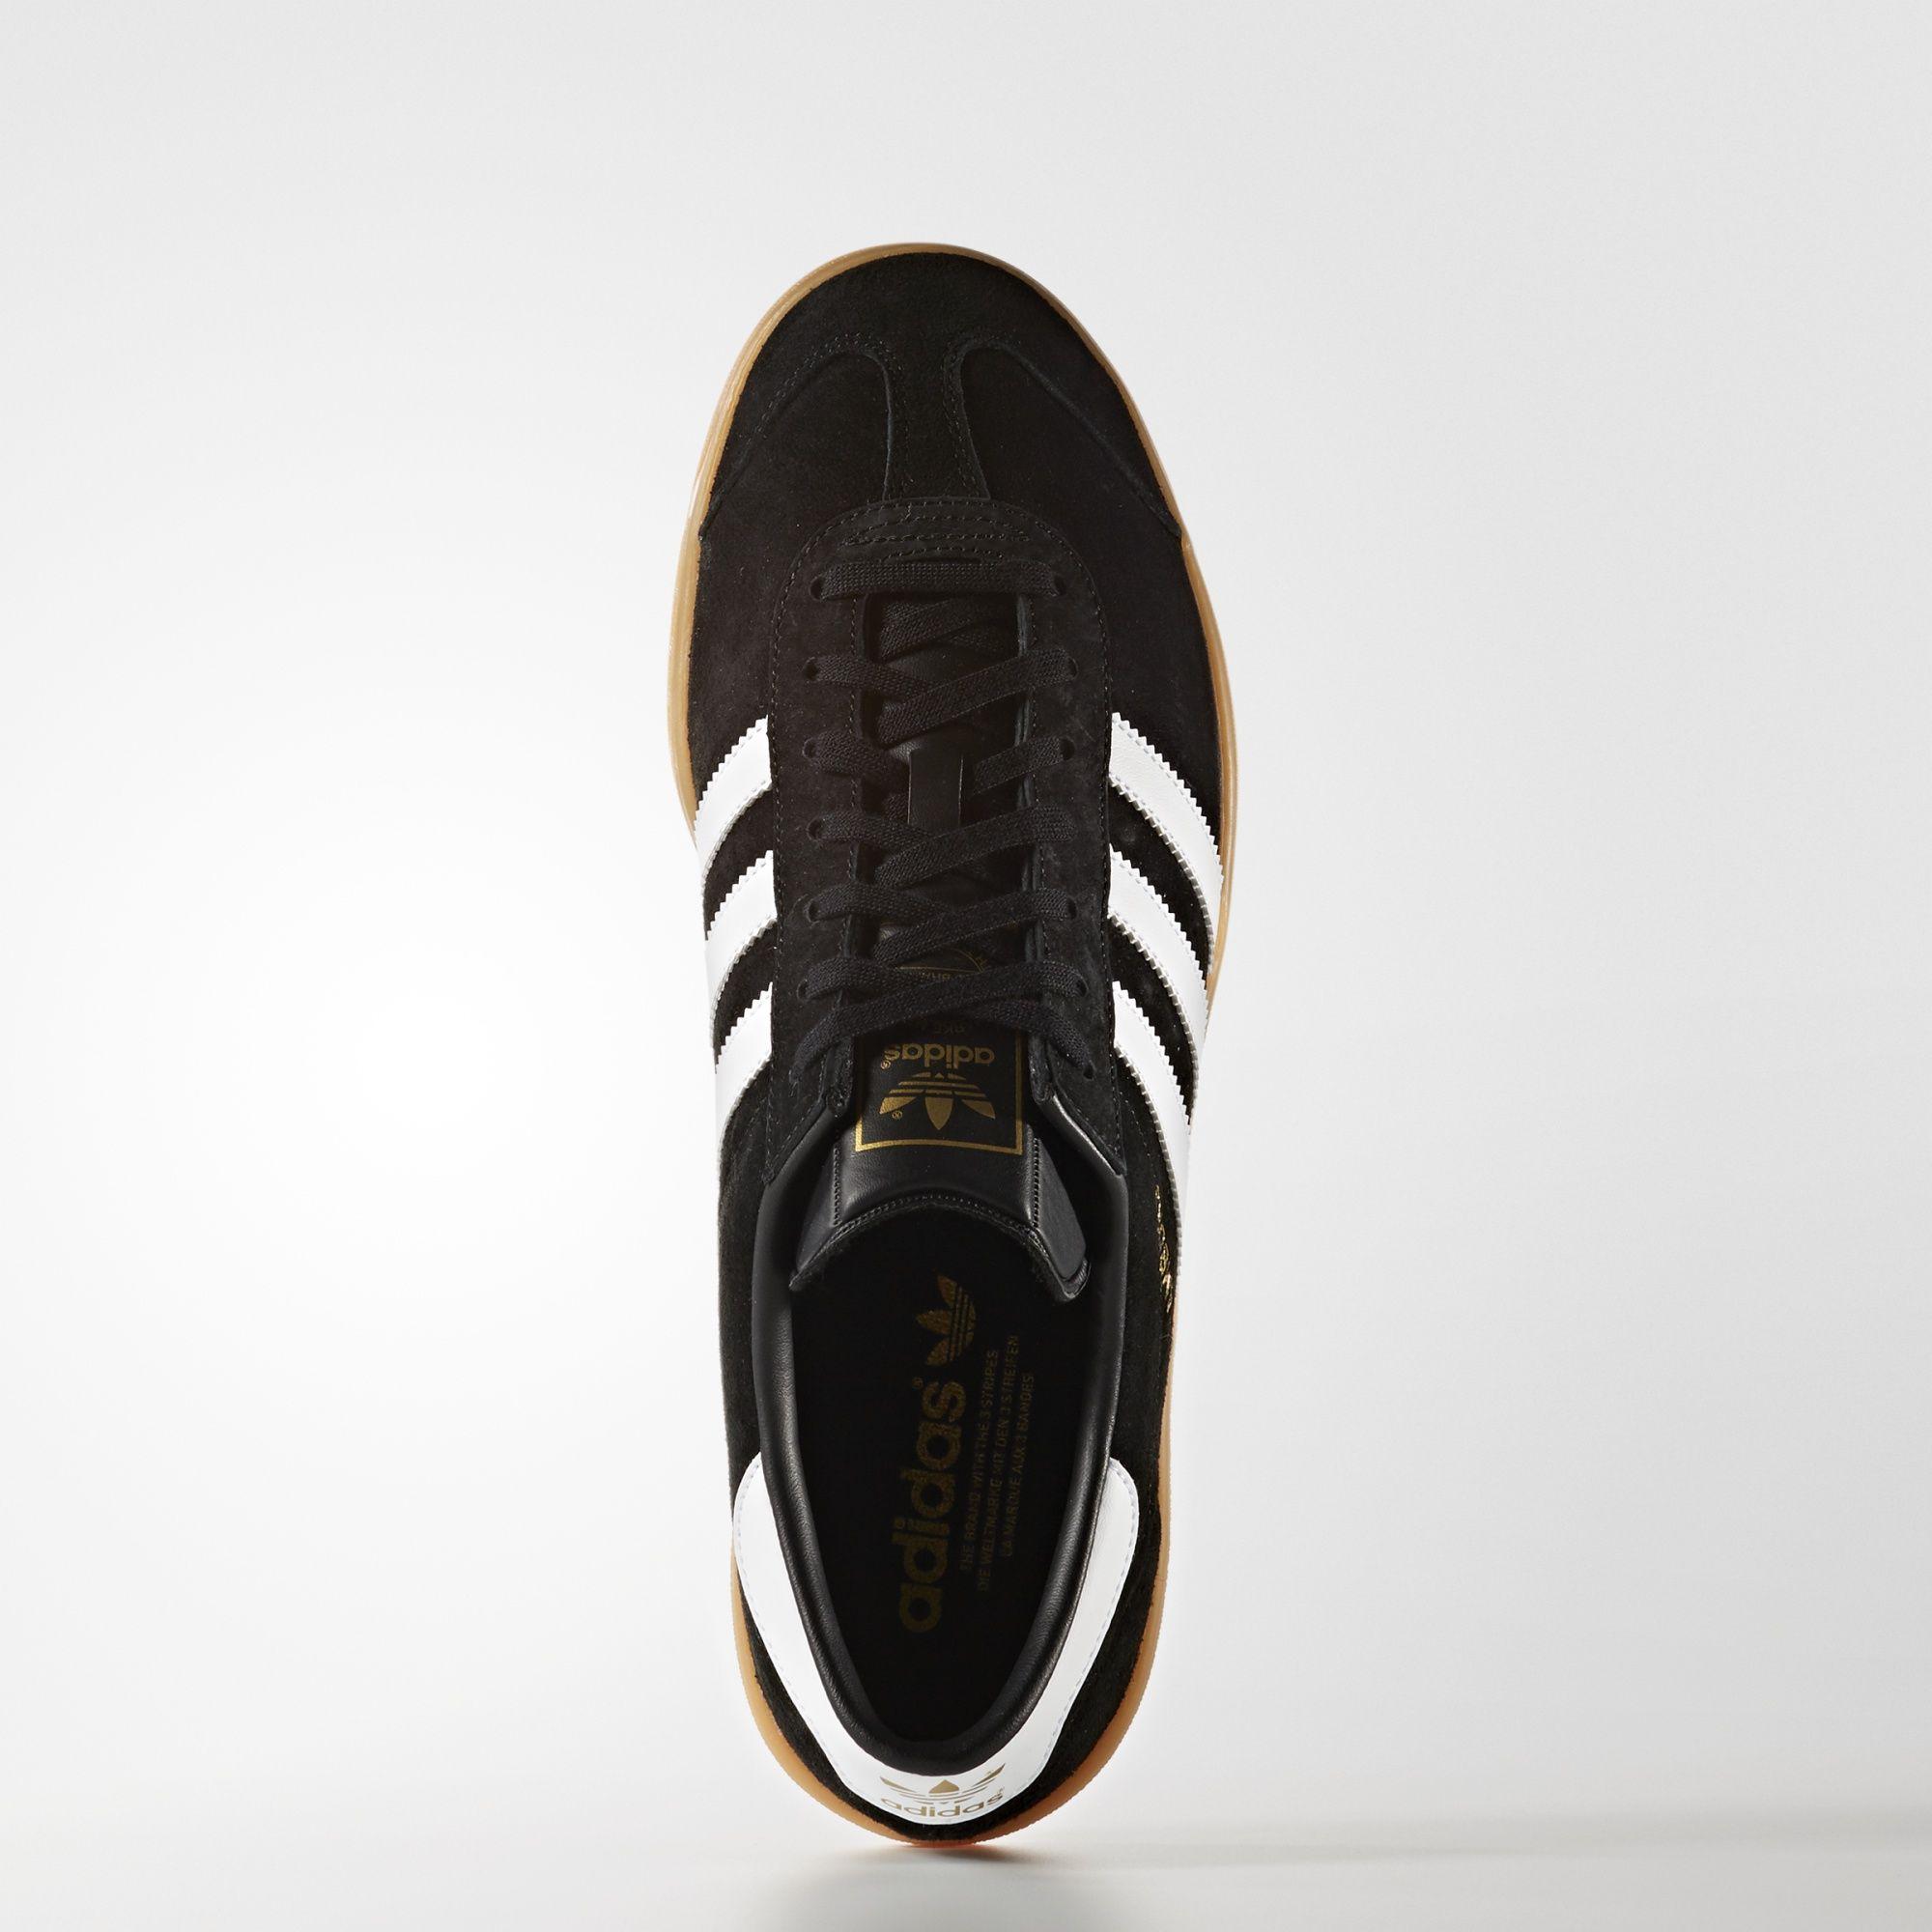 1329db871fb721 Кроссовки Hamburg M S76696 adidas Originals - Украина   ONETEAM.COM.UA